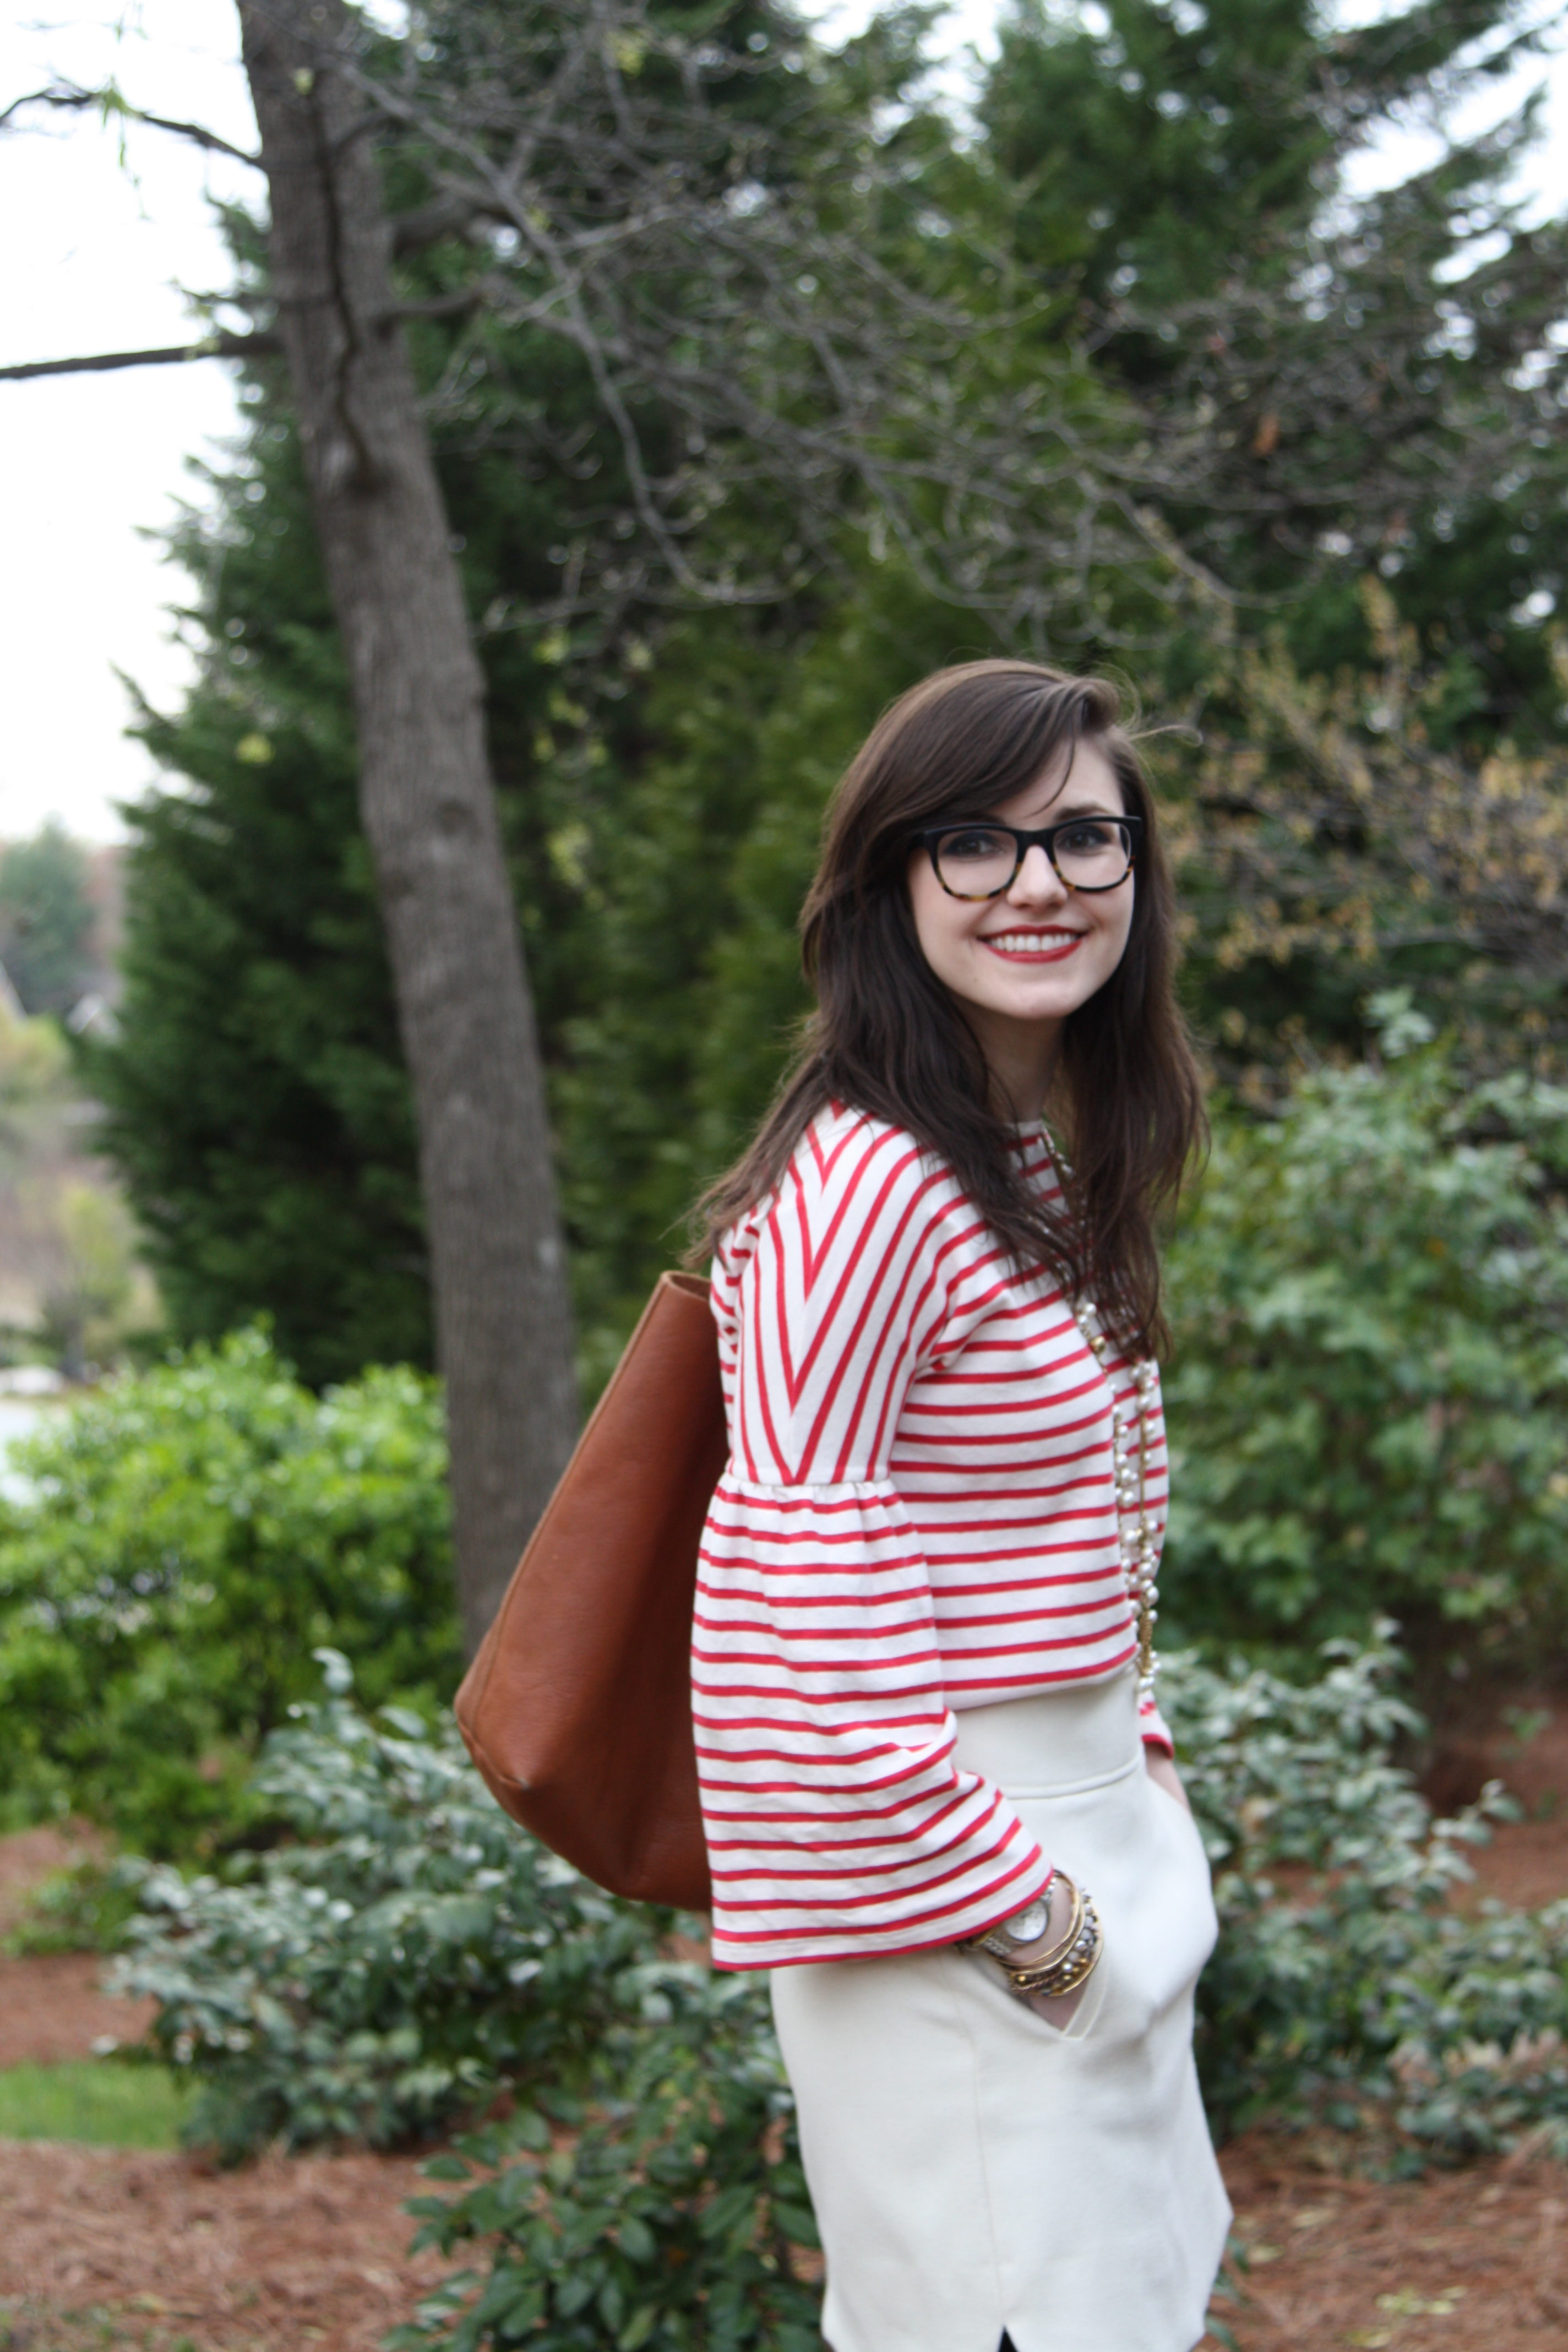 Candy Cane Stripes - Lefty Living Life